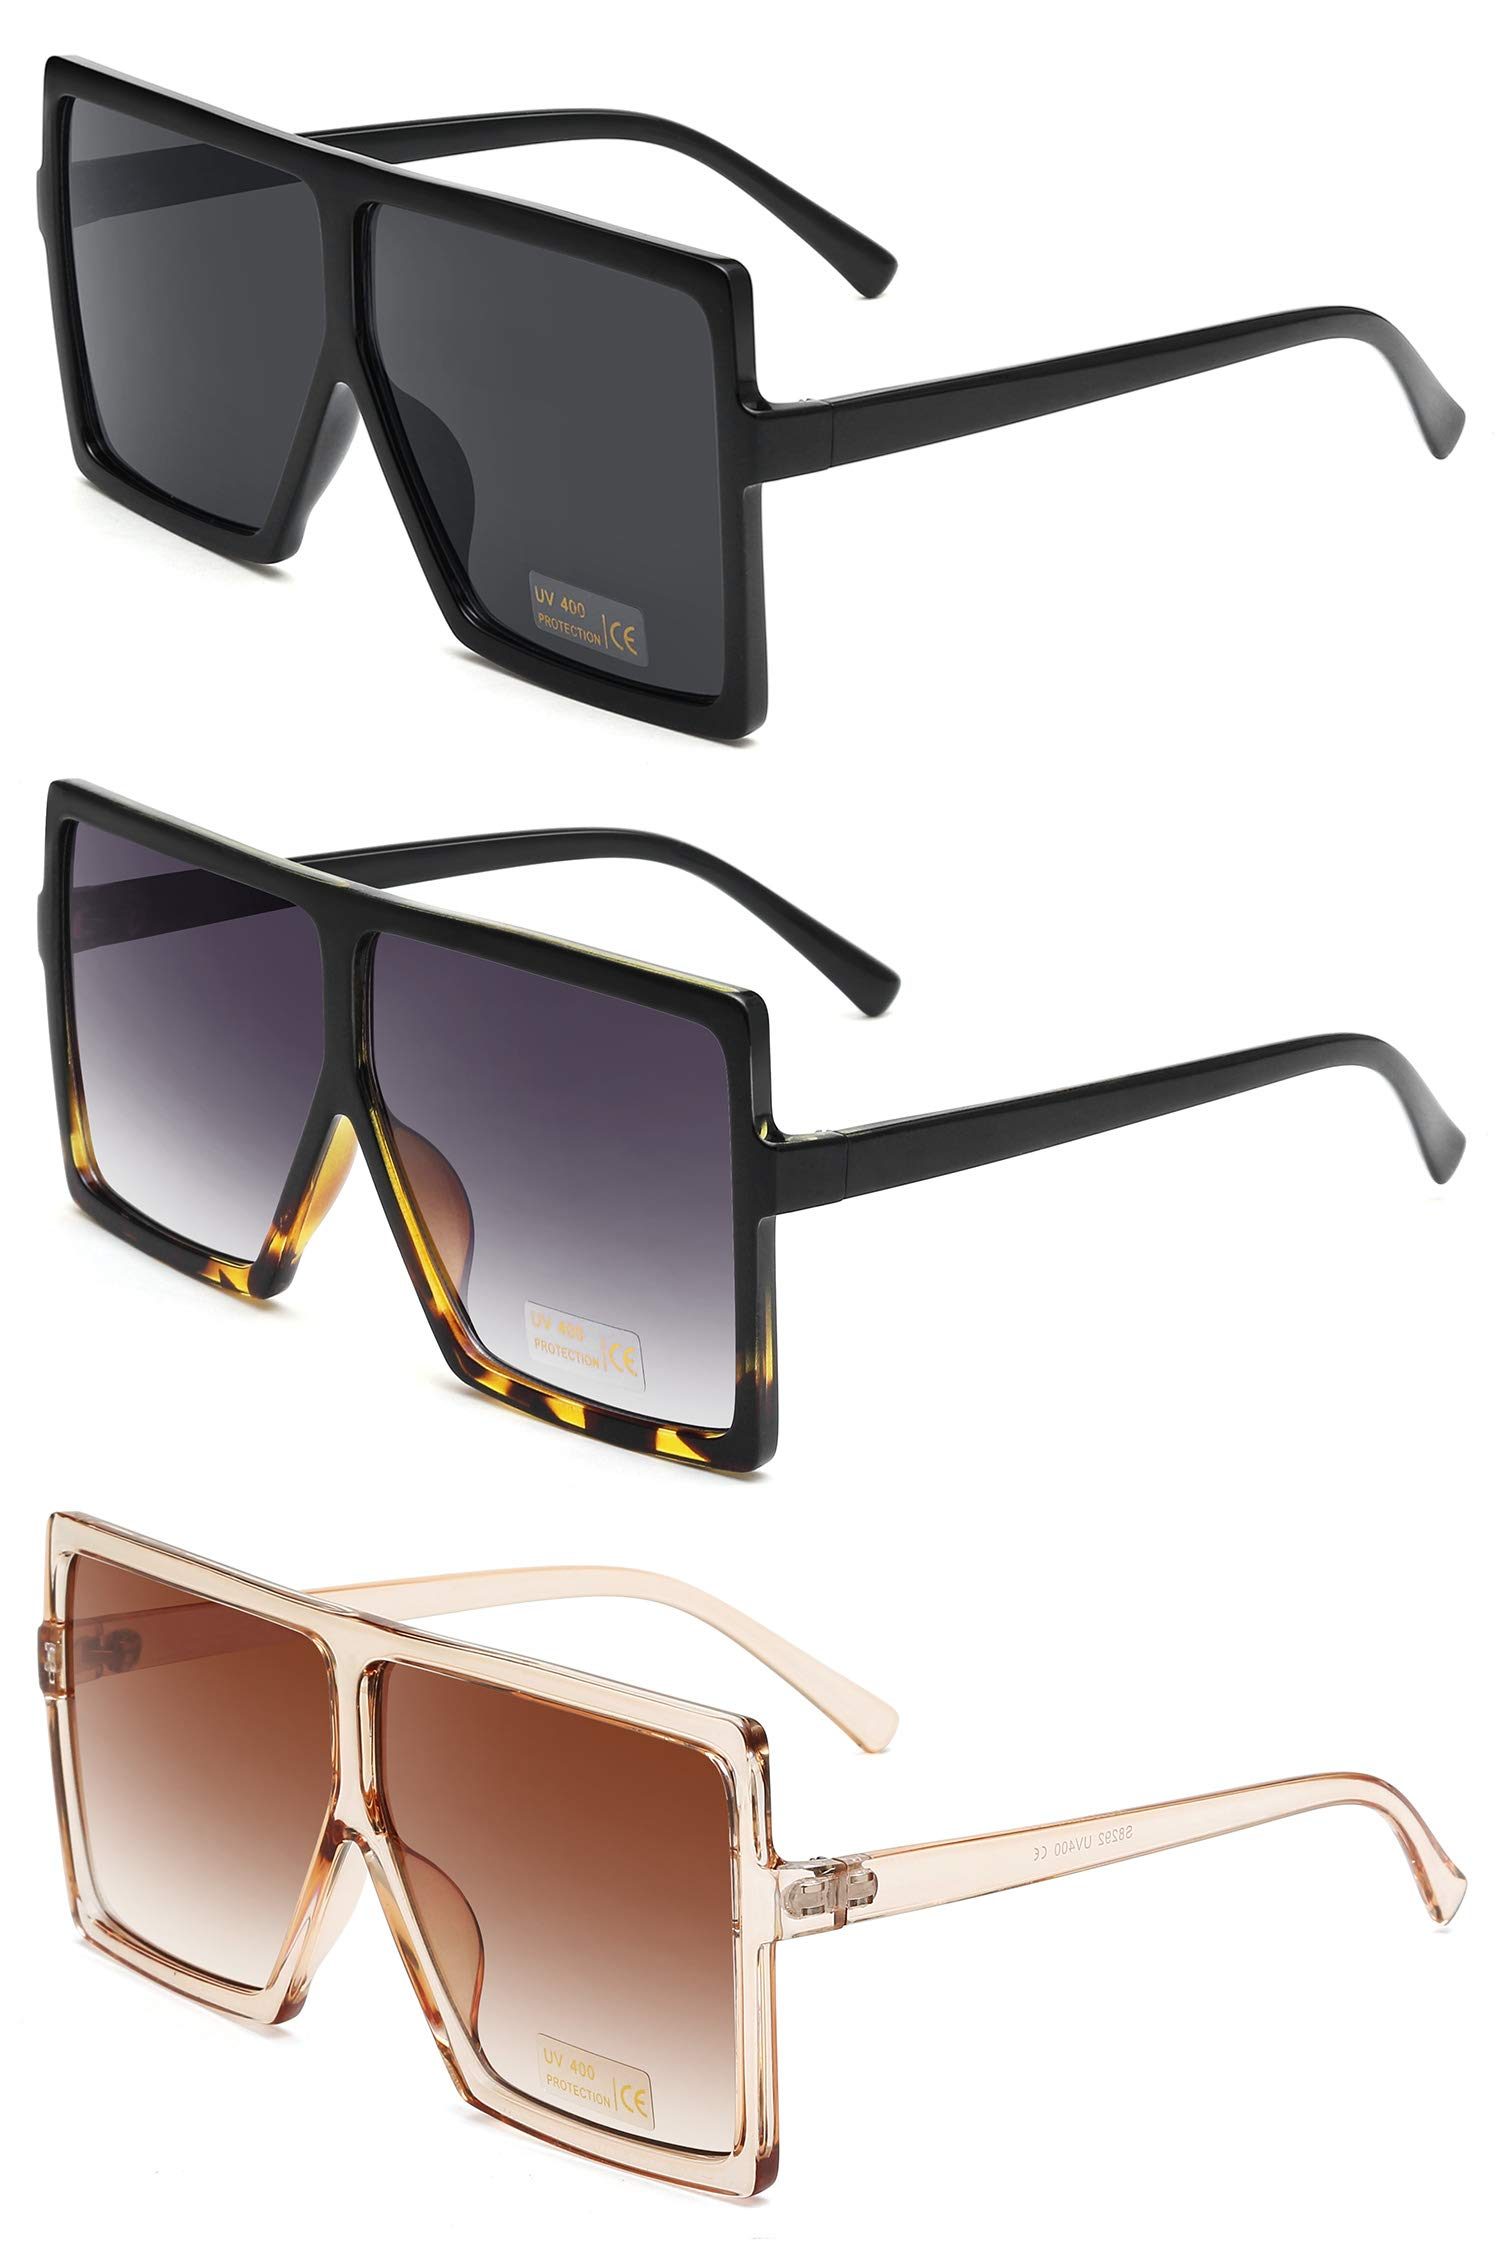 GRFISIA Square Oversized Sunglasses for Women Men Flat Top Fashion Shades (3PCS-Black- leopard-orange, 2.56) by GRFISIA